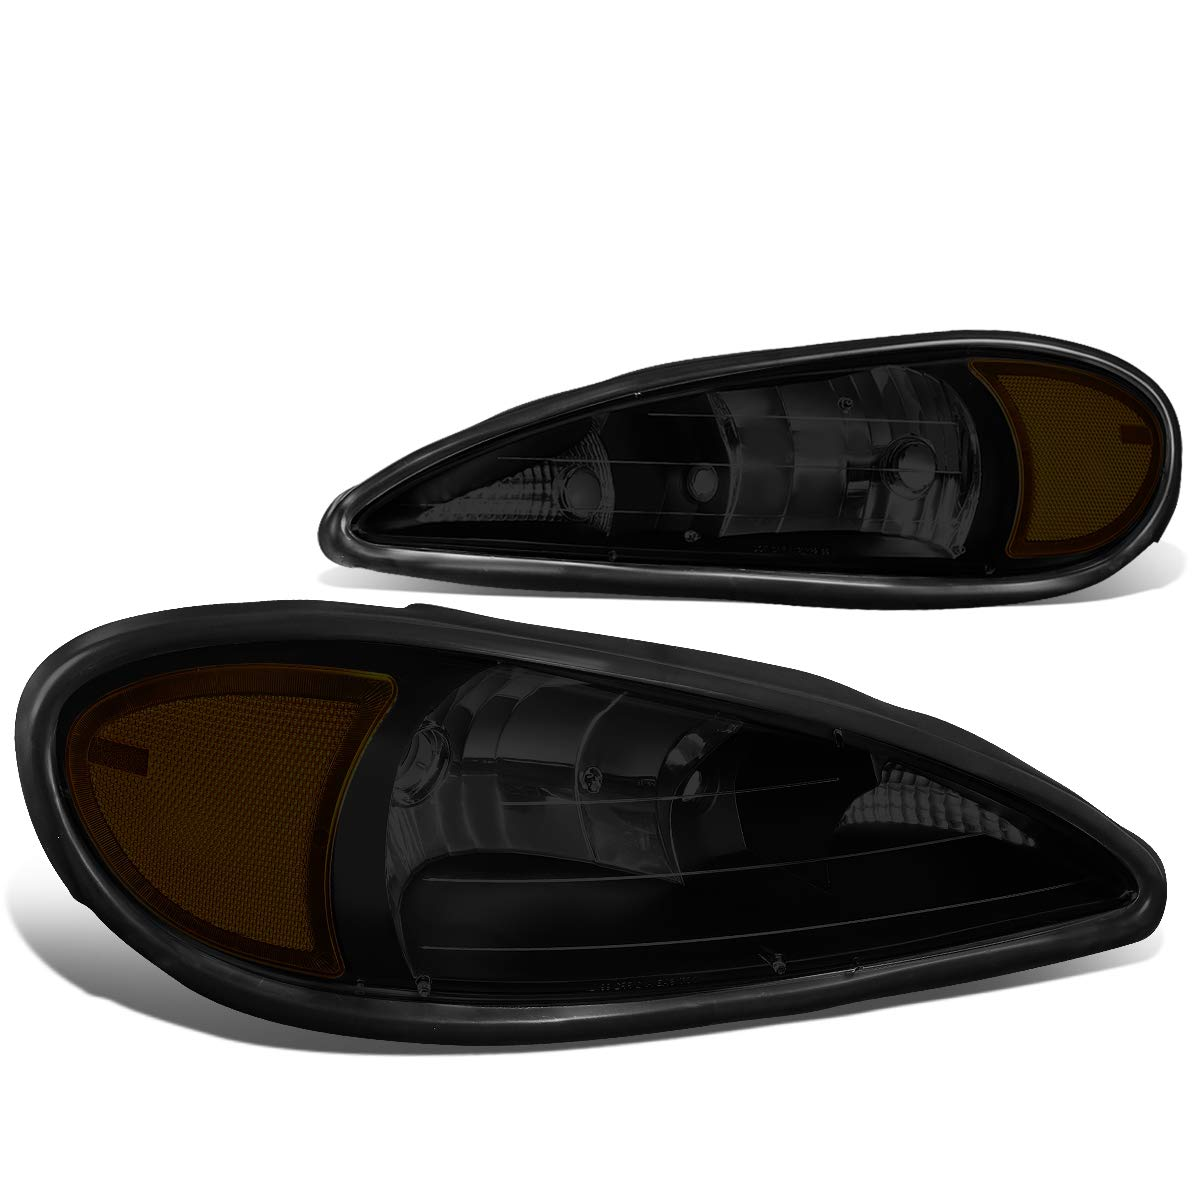 Pair Smoked Housing Amber Corner Headlight/Lamps Replacement for 99-05 Pontiac Grand Am